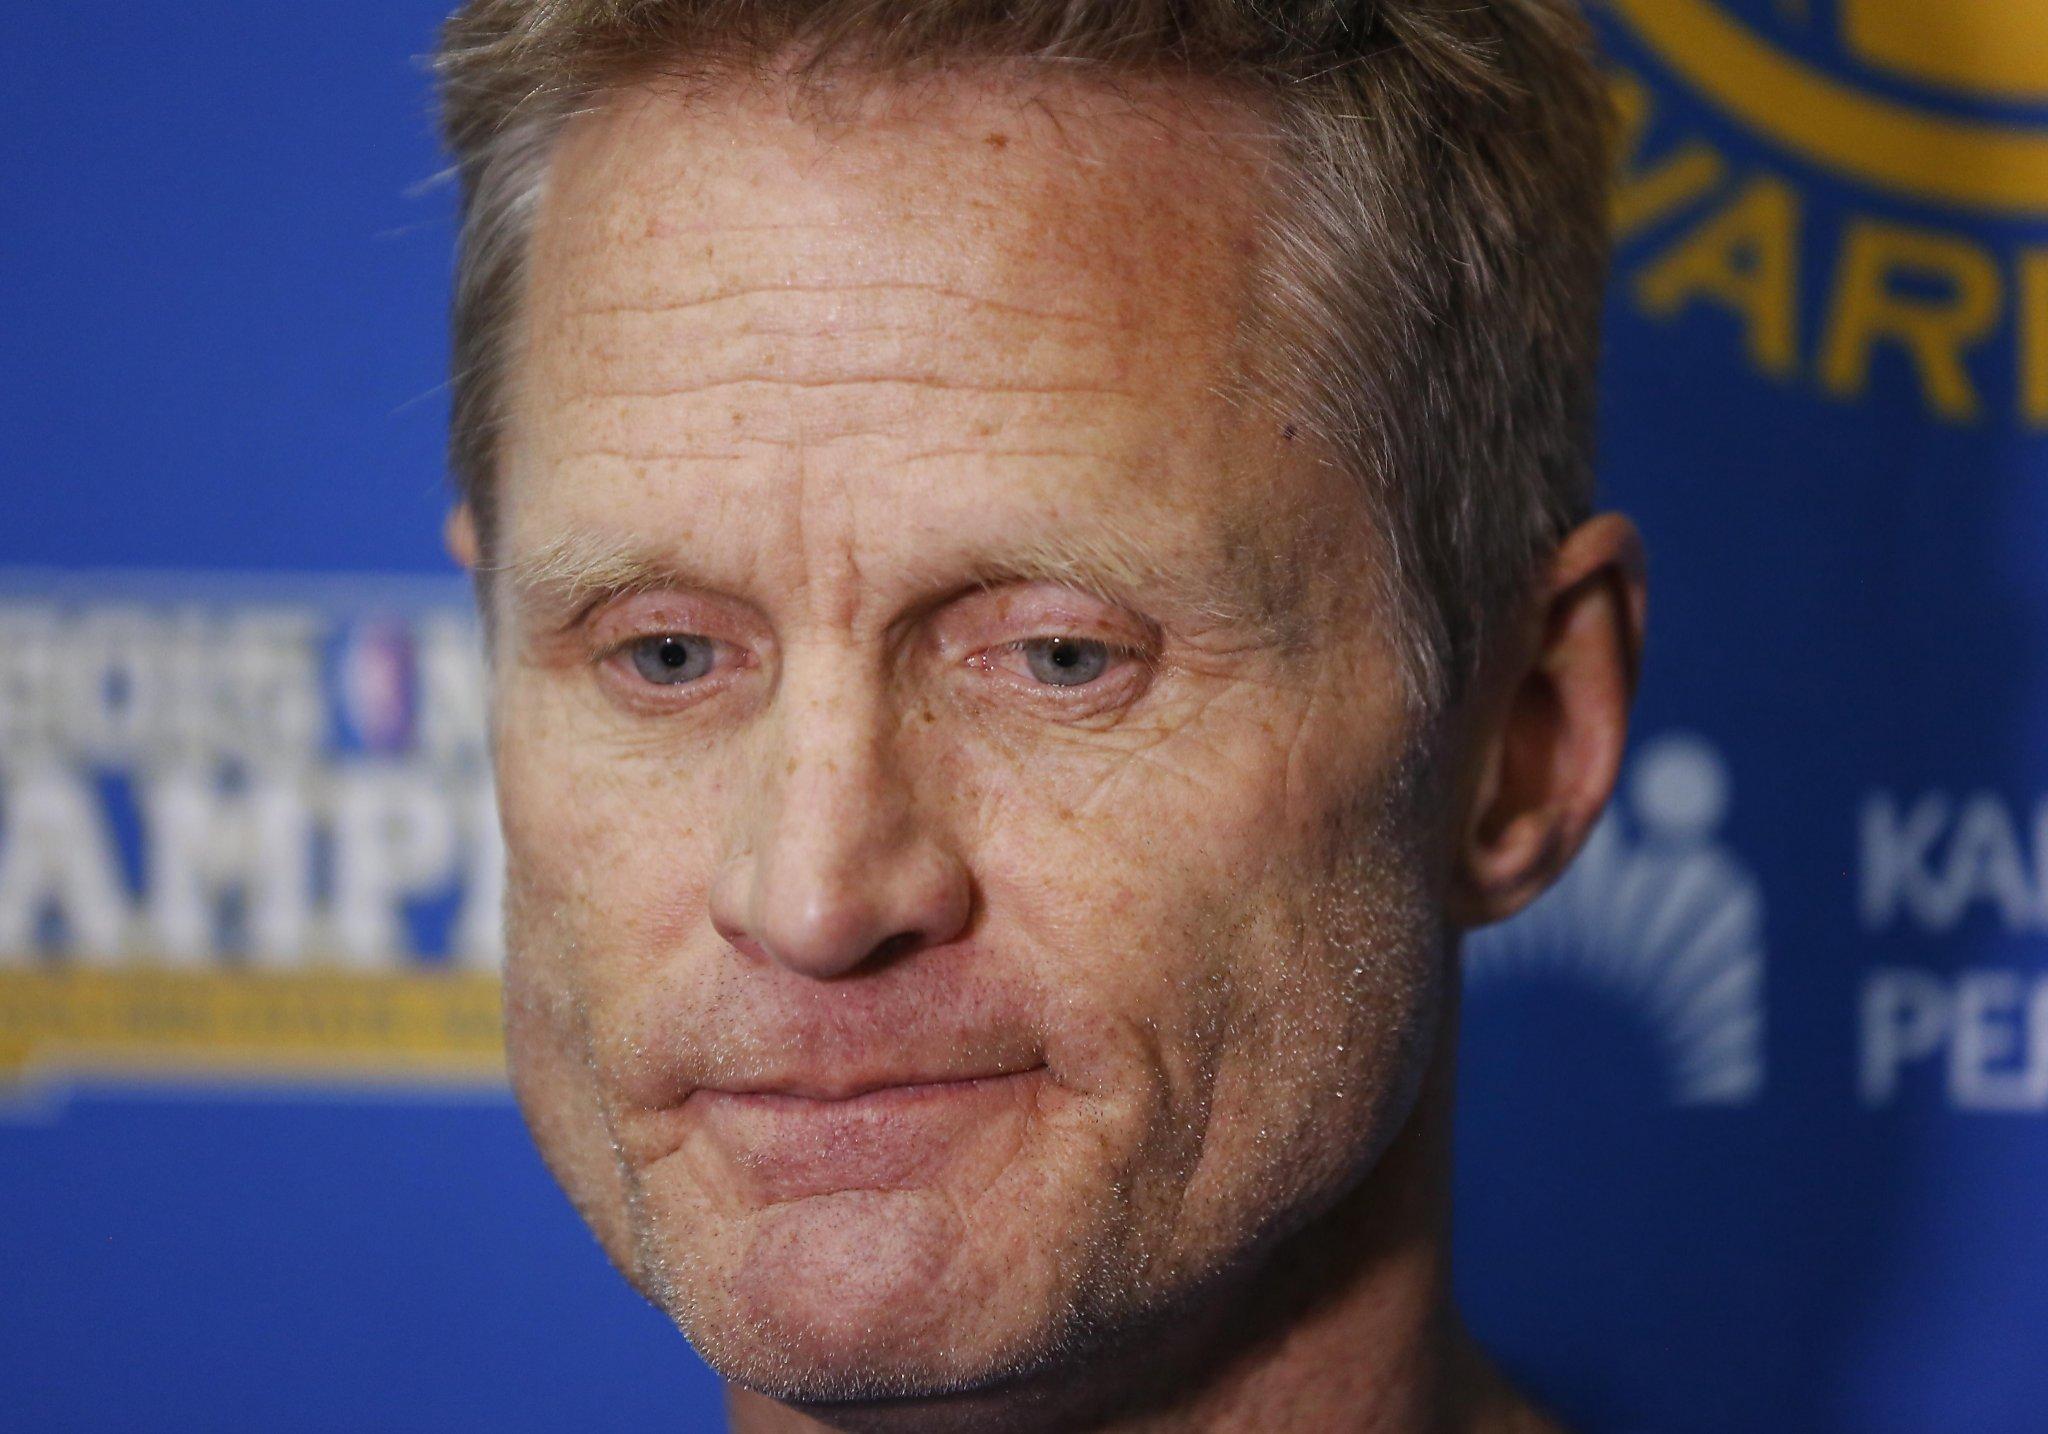 Warriors' Steve Kerr says NBA coaching carousel 'makes me a little nervous'